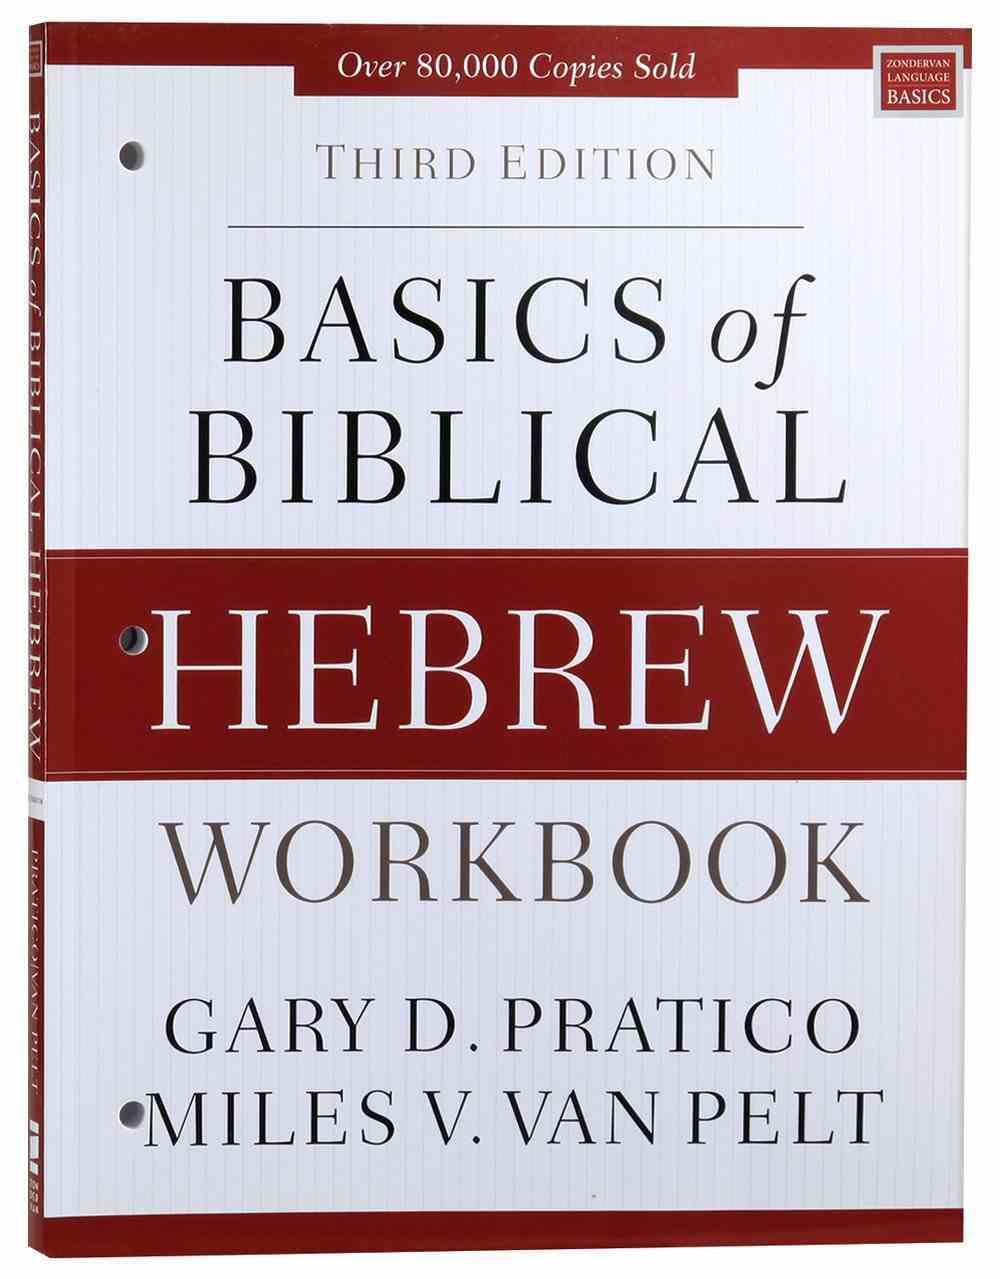 Basics of Biblical Hebrew (3rd Edition) (Workbook) Paperback